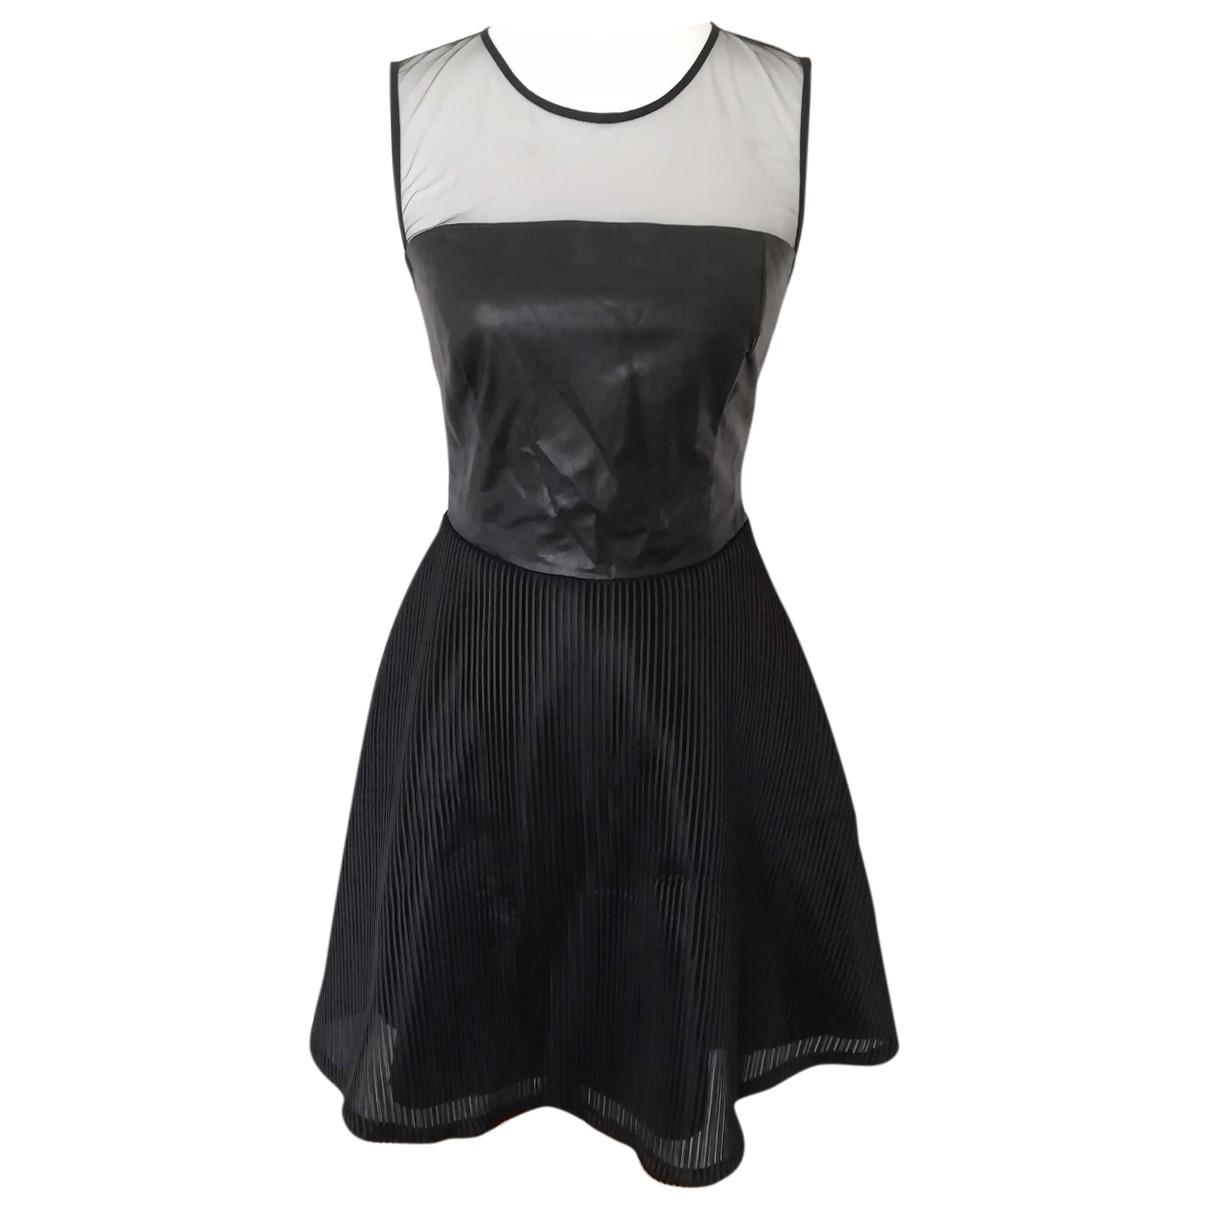 Liu.jo \N Kleid in  Schwarz Polyester